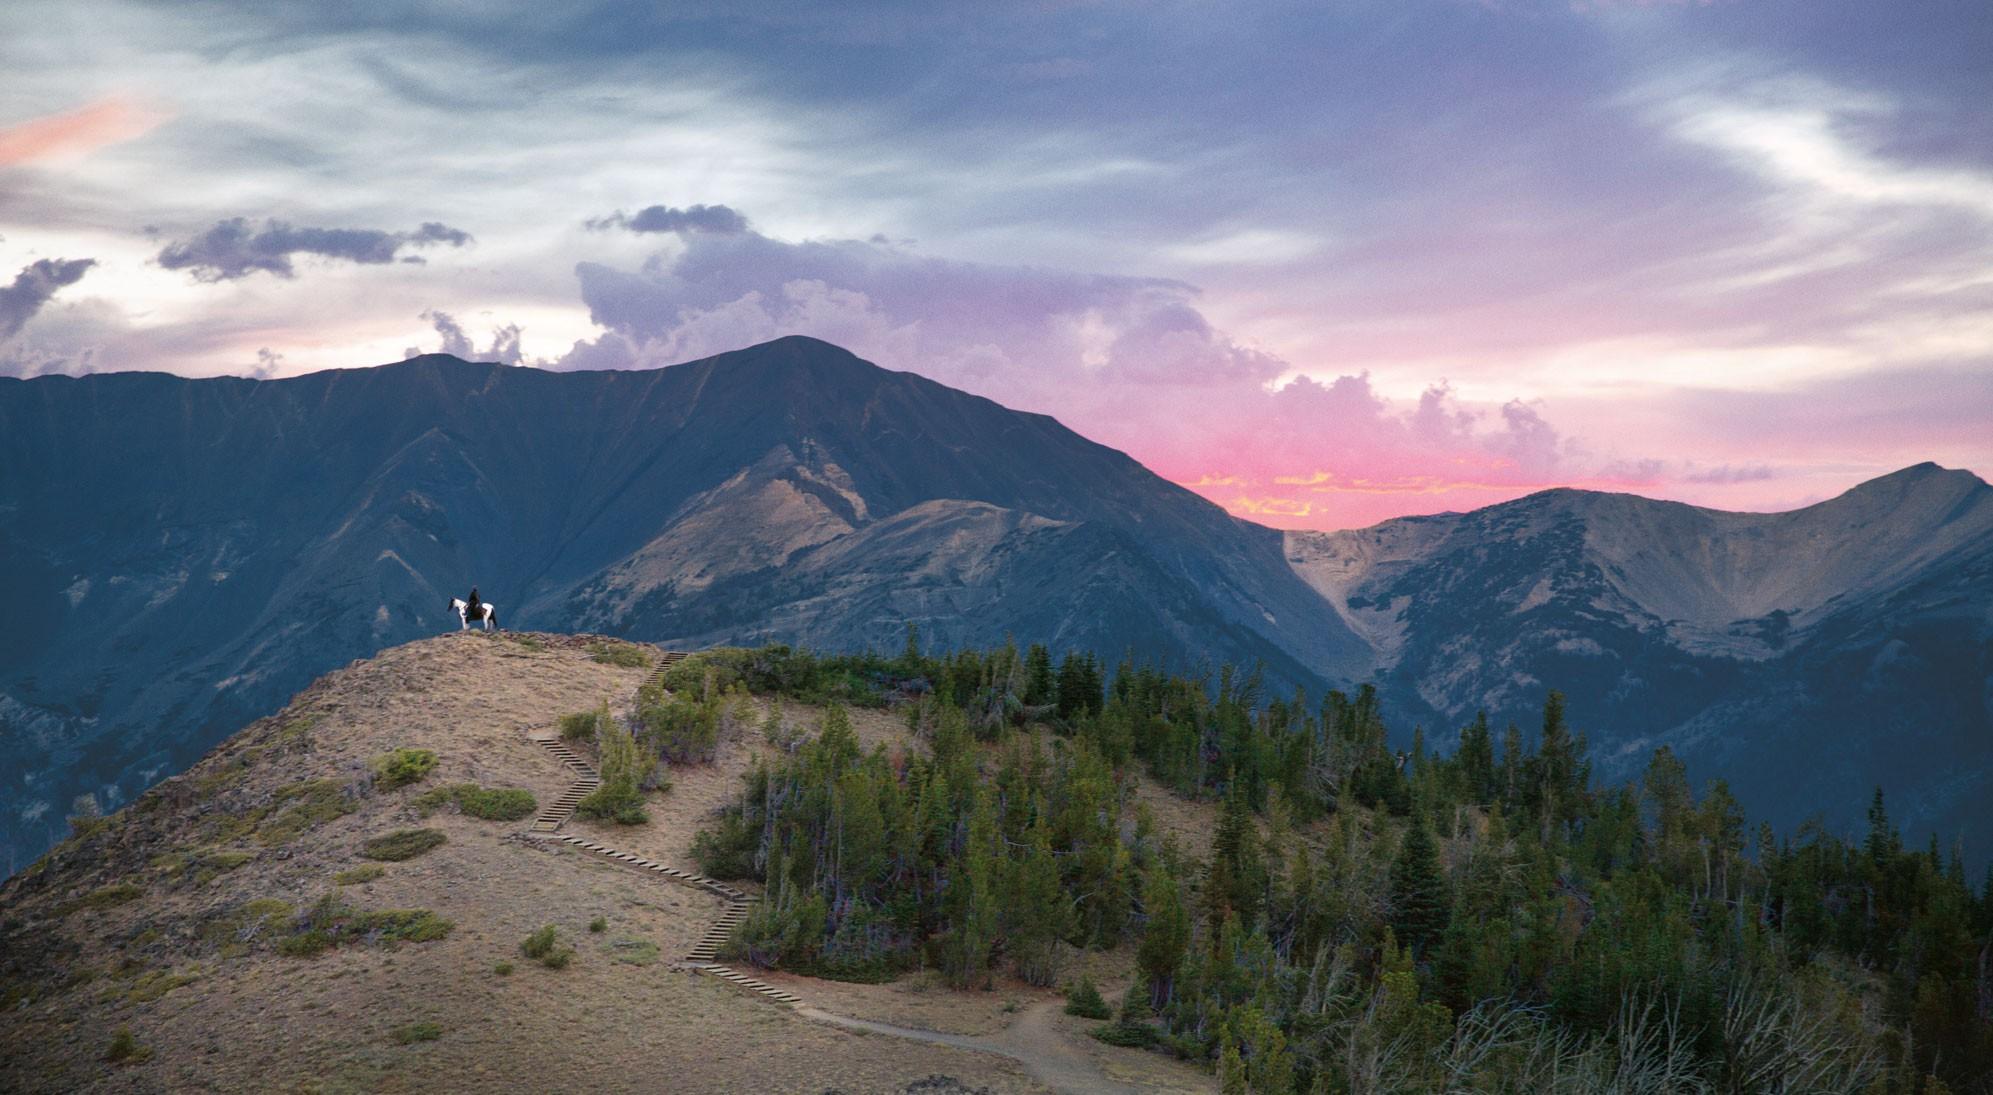 Mt. Howard summit in the Wallowa Mountains